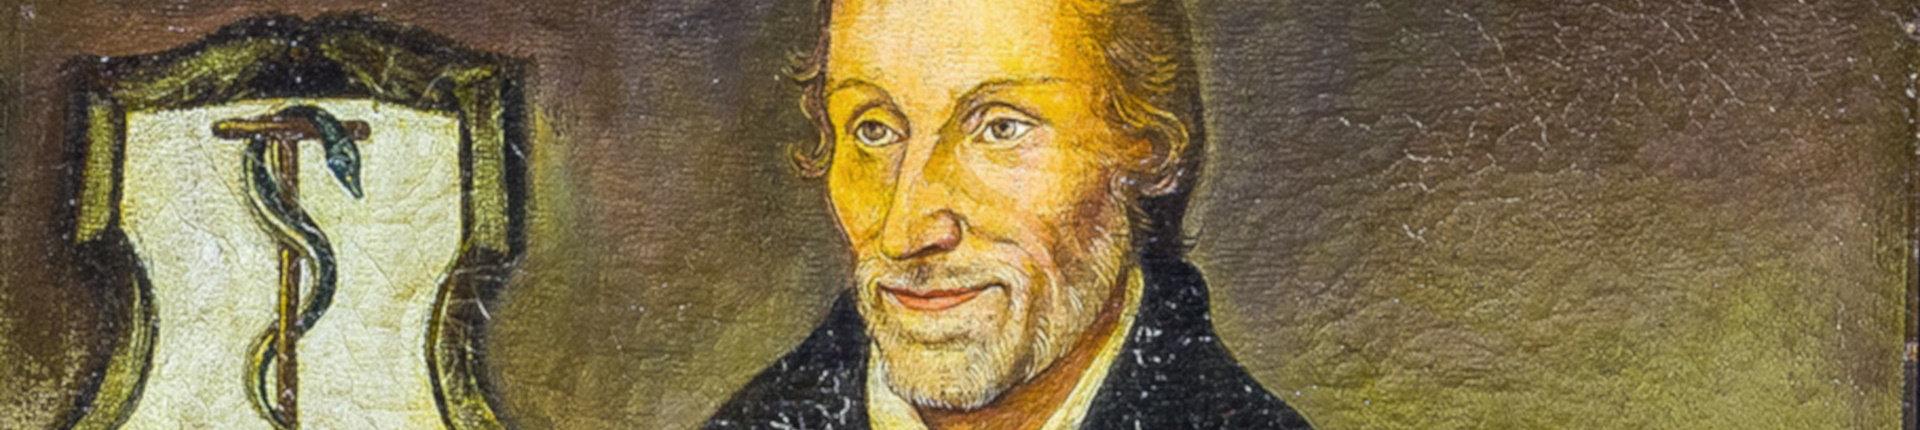 Philipp Melanchthon / Quelle: Kunstverlag Peda